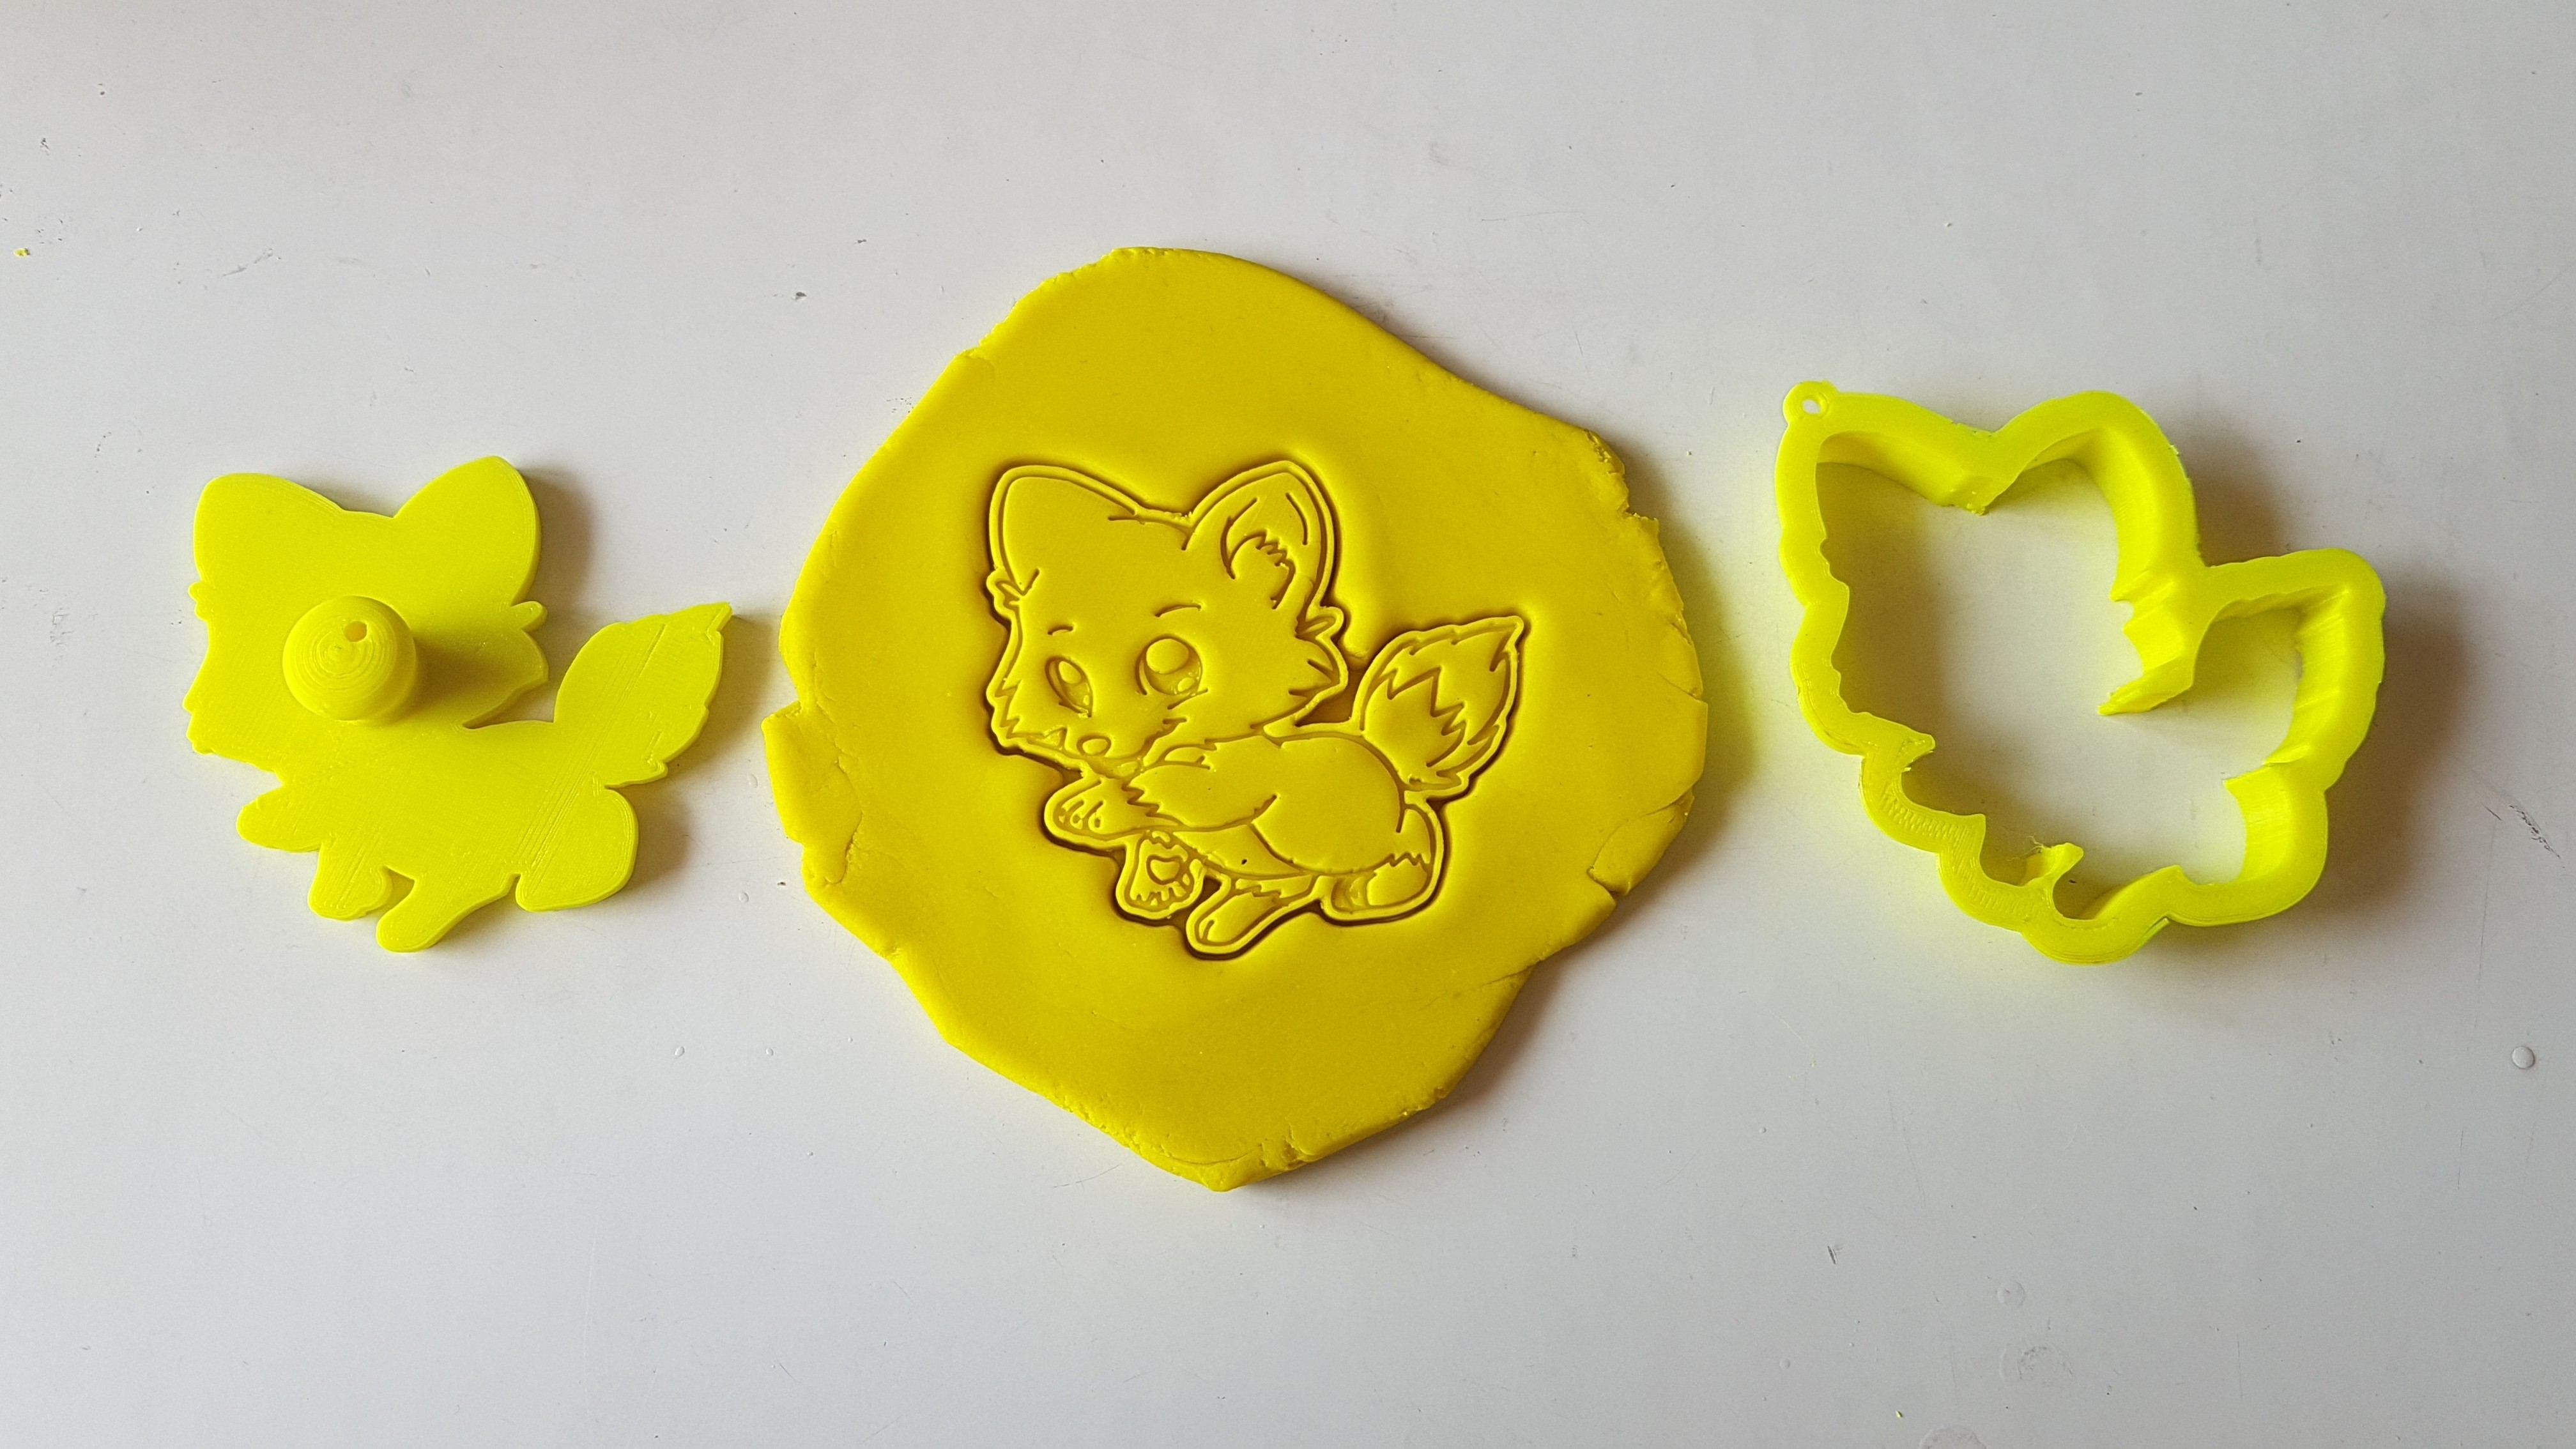 20180828_135736.jpg Download STL file Cute Fox Cookie Cutter • 3D printer template, 3dfactory